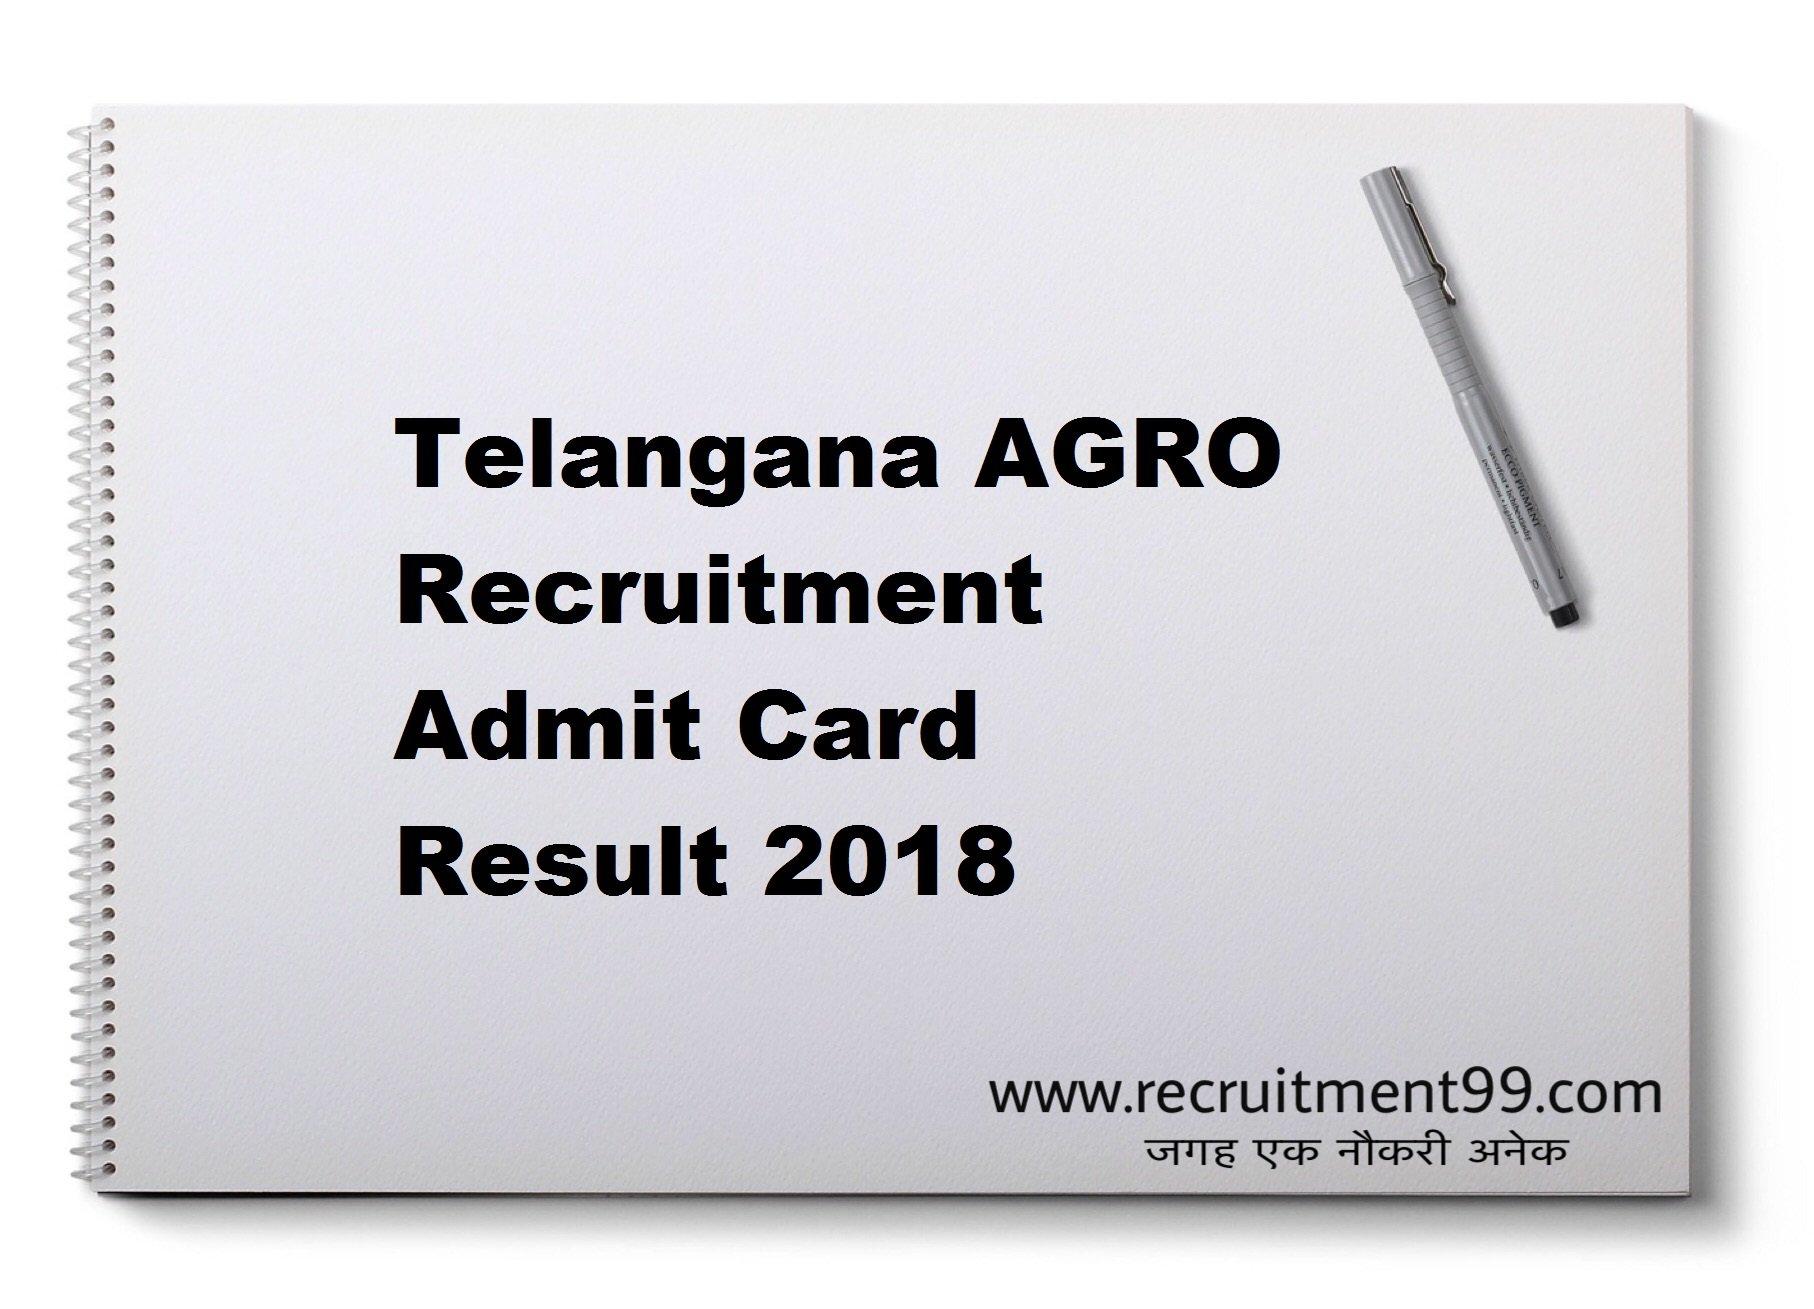 Telangana AGRO Recruitment Admit Card Result 2018